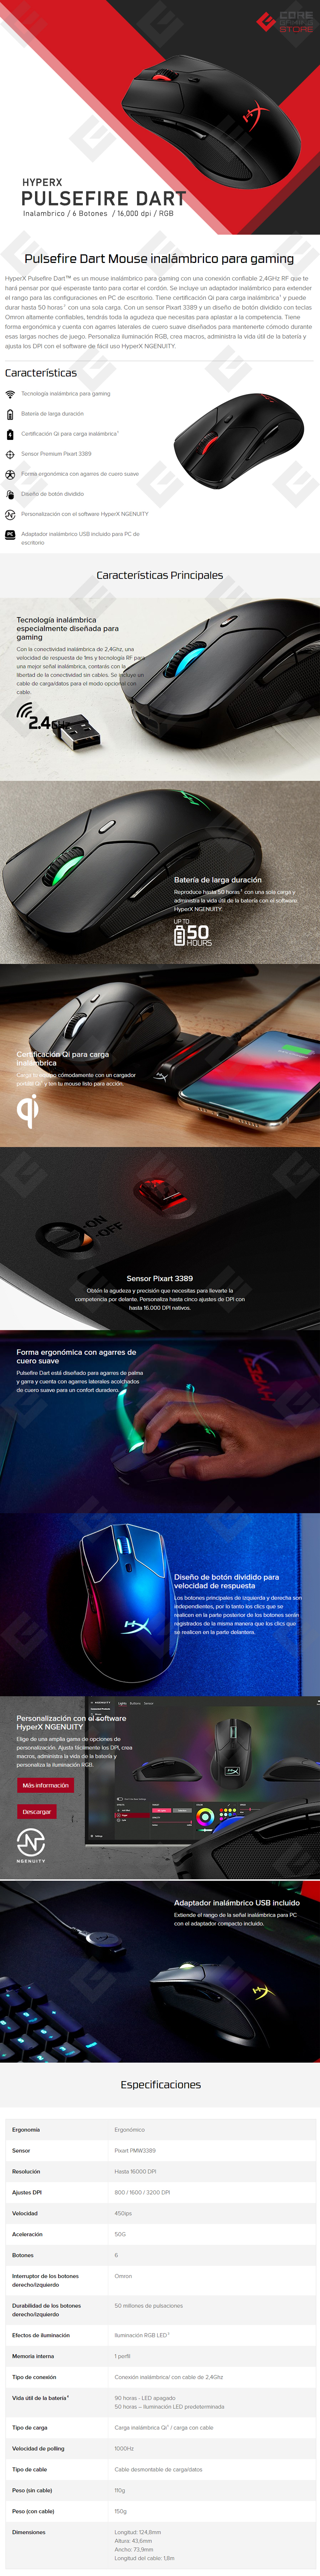 Mouse HyperX Pulsefire Dart RGB, Inalámbrico, 6 Botones, 16,000 Dpi, HX-MC006B